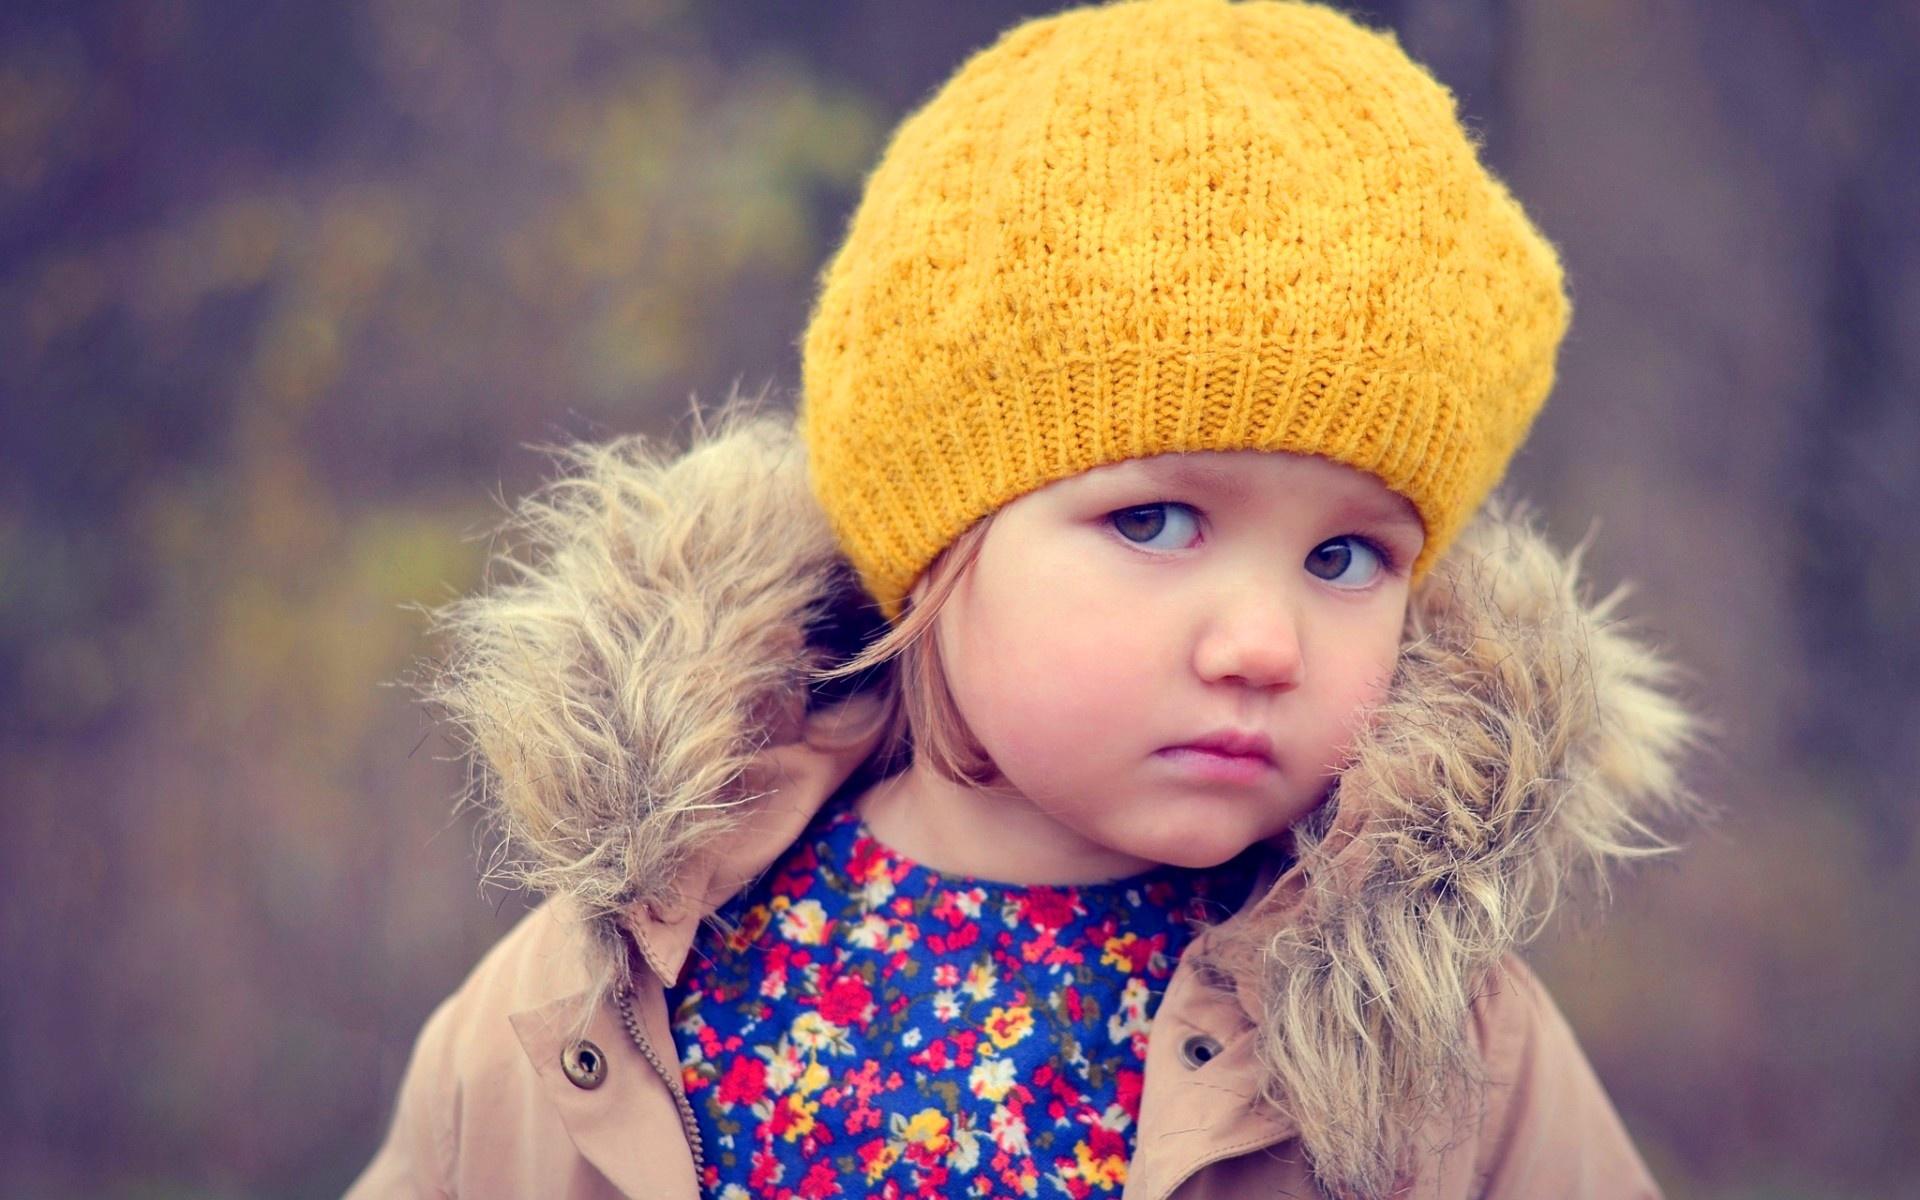 Image of: Baby Girl Cute Baby Full Hd Wallpapers Pixelstalknet Cute Baby Wallpapers Hd Pixelstalknet